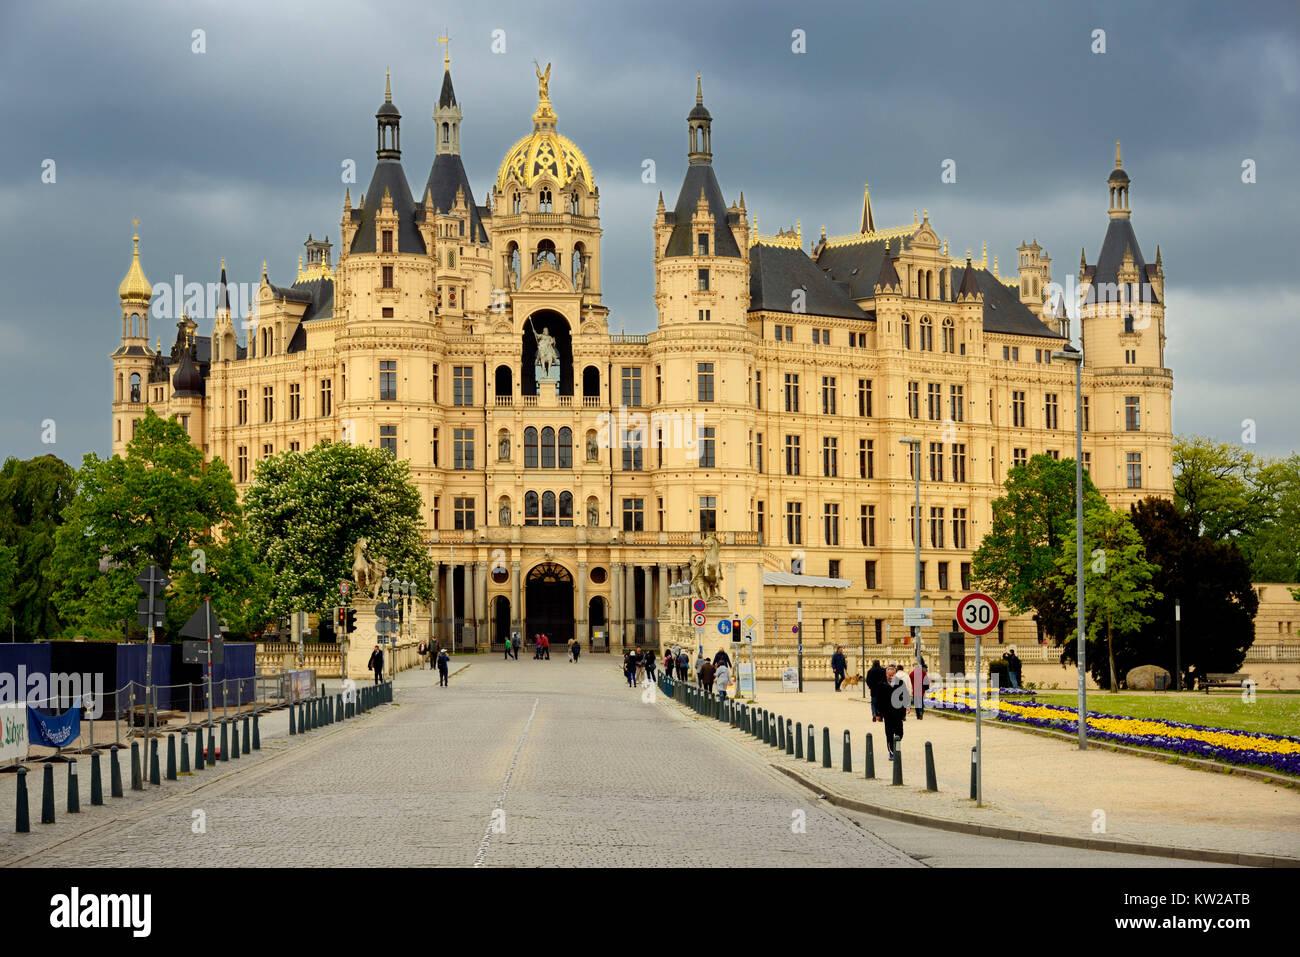 Schweriner castle, castle facade in the main access, Schweriner Schloss, Schlossfassade am Hauptzugang - Stock Image